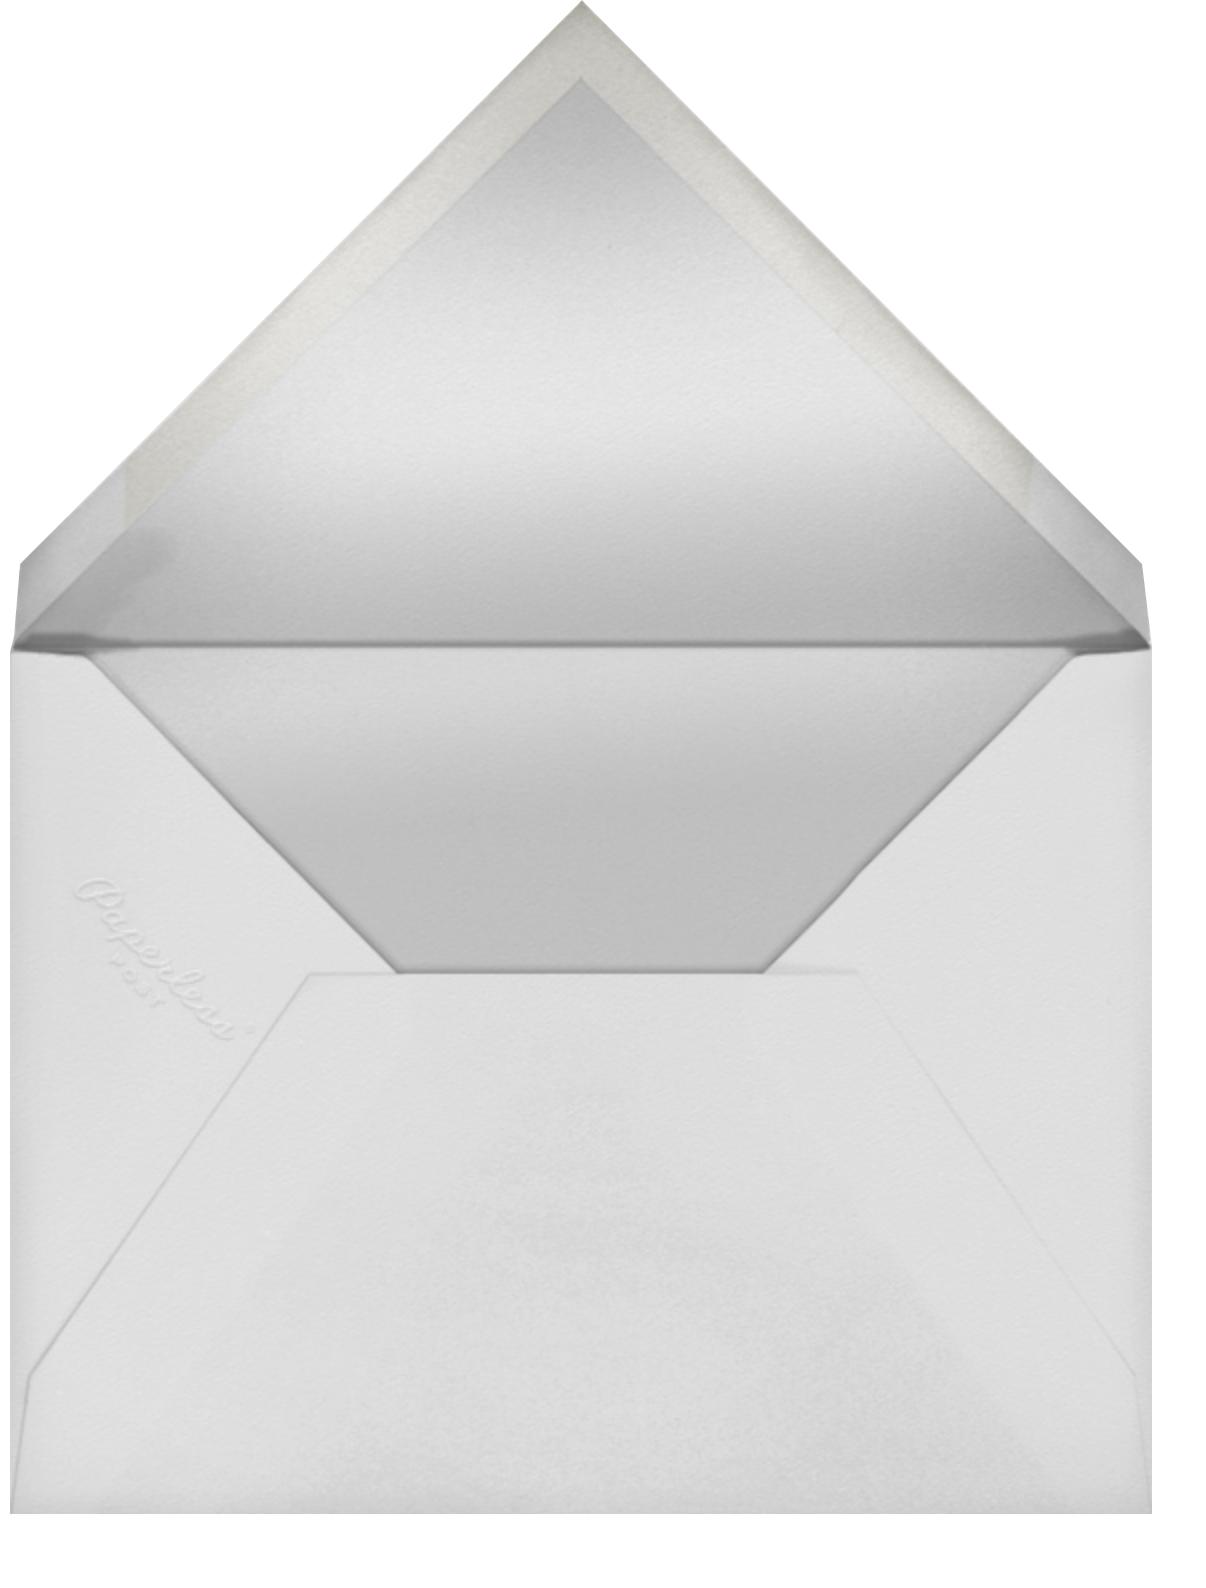 Bulletin (Program) - Slate - Paperless Post - Menus and programs - envelope back